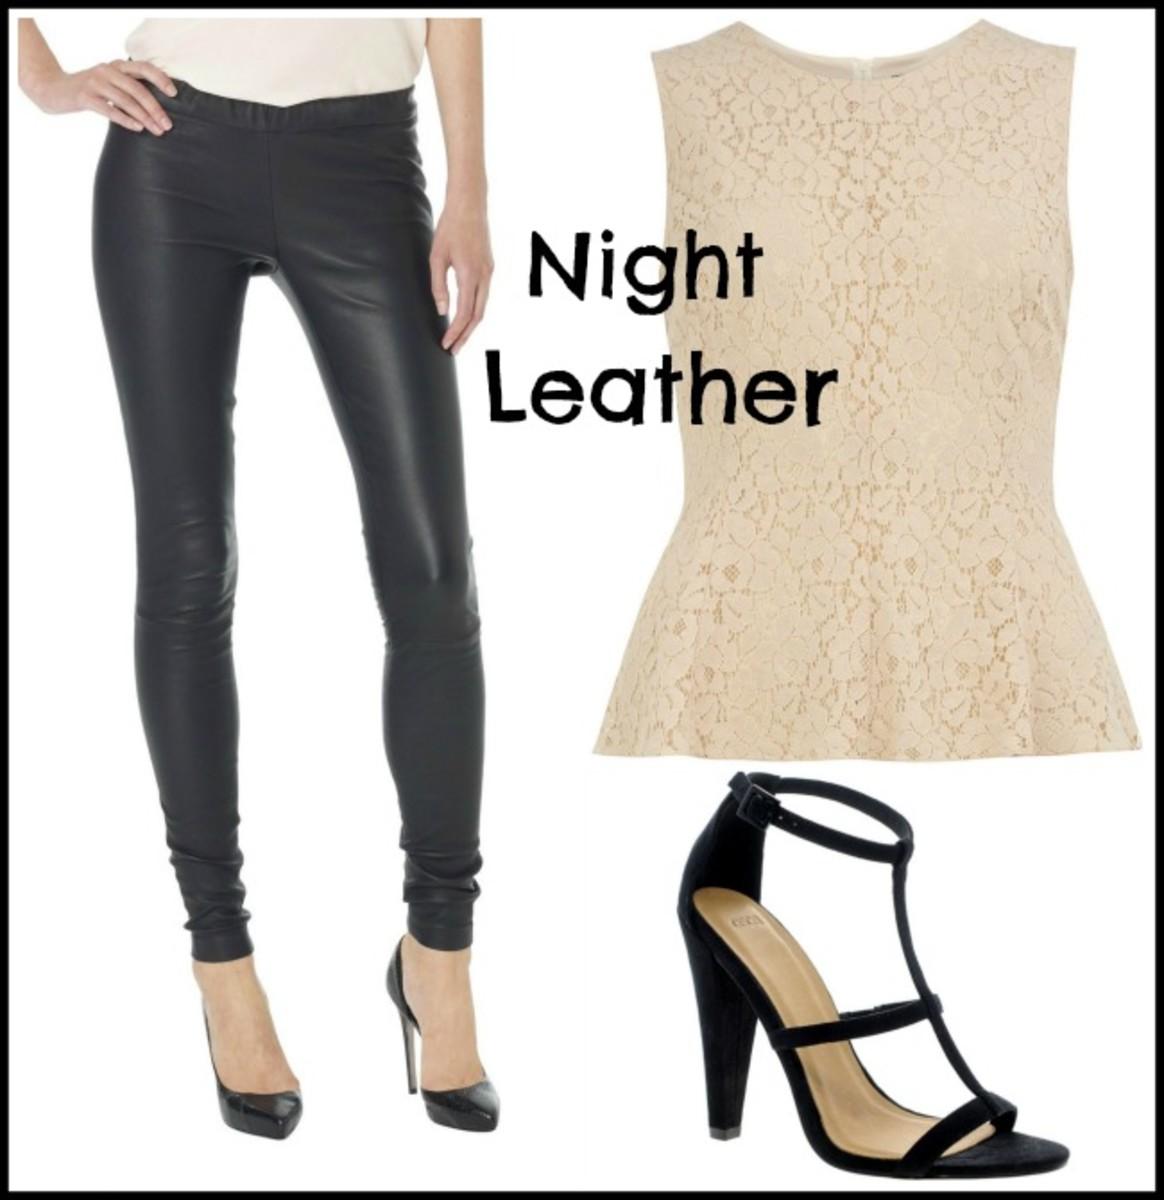 LeatherNight